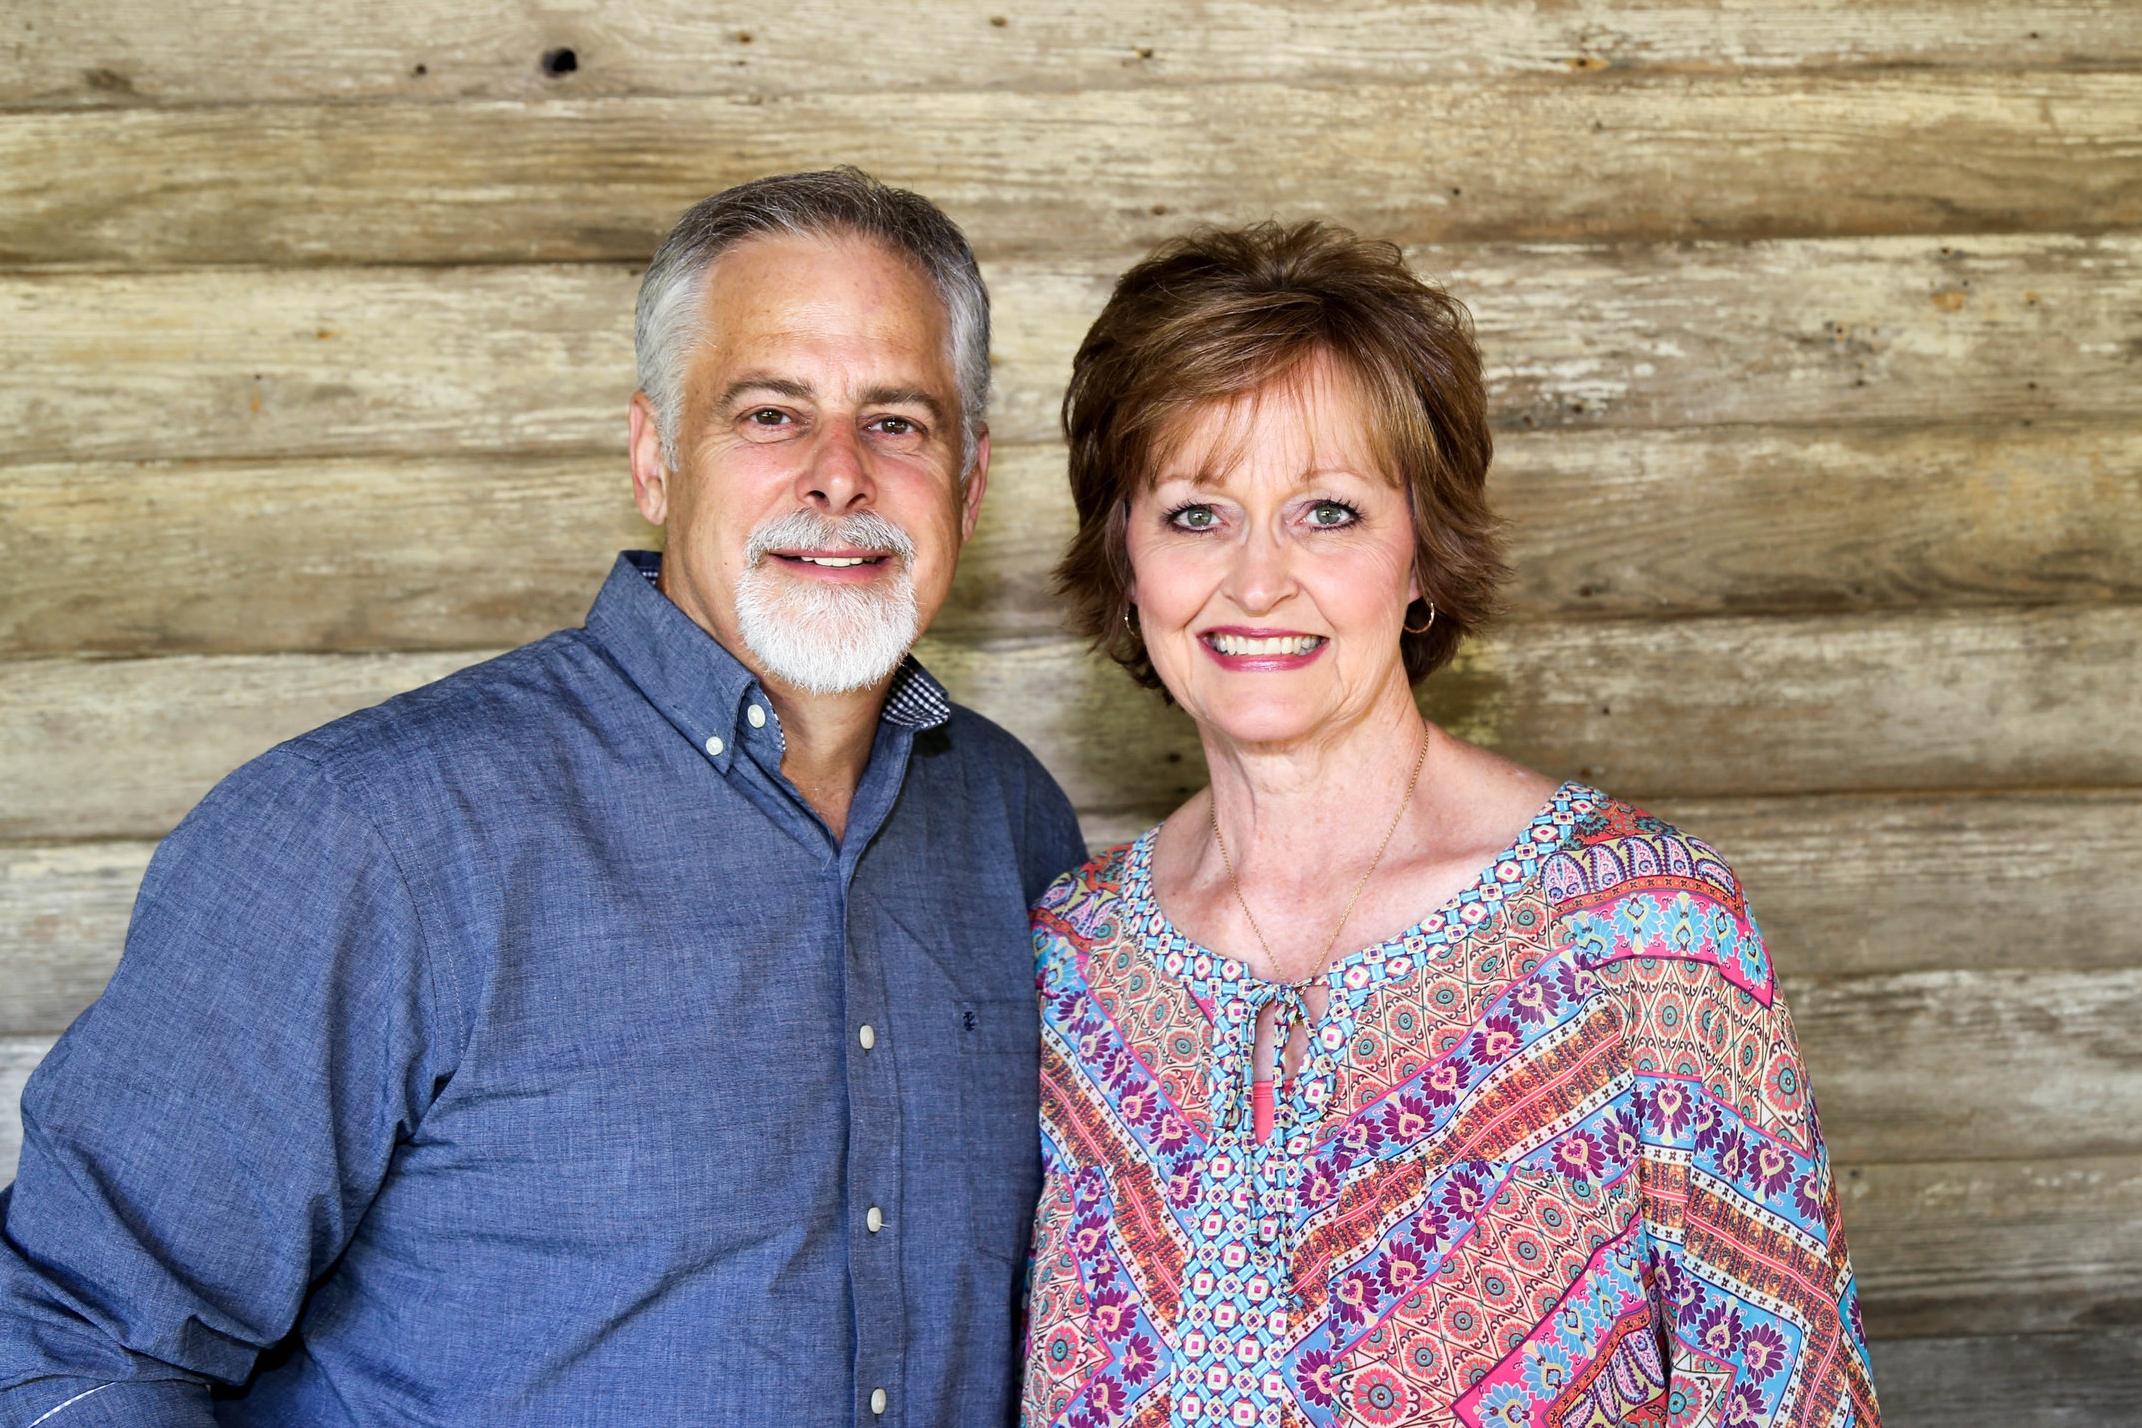 Chuck and Karen enjoying a trip to Old Washington, Arkansas, last year.